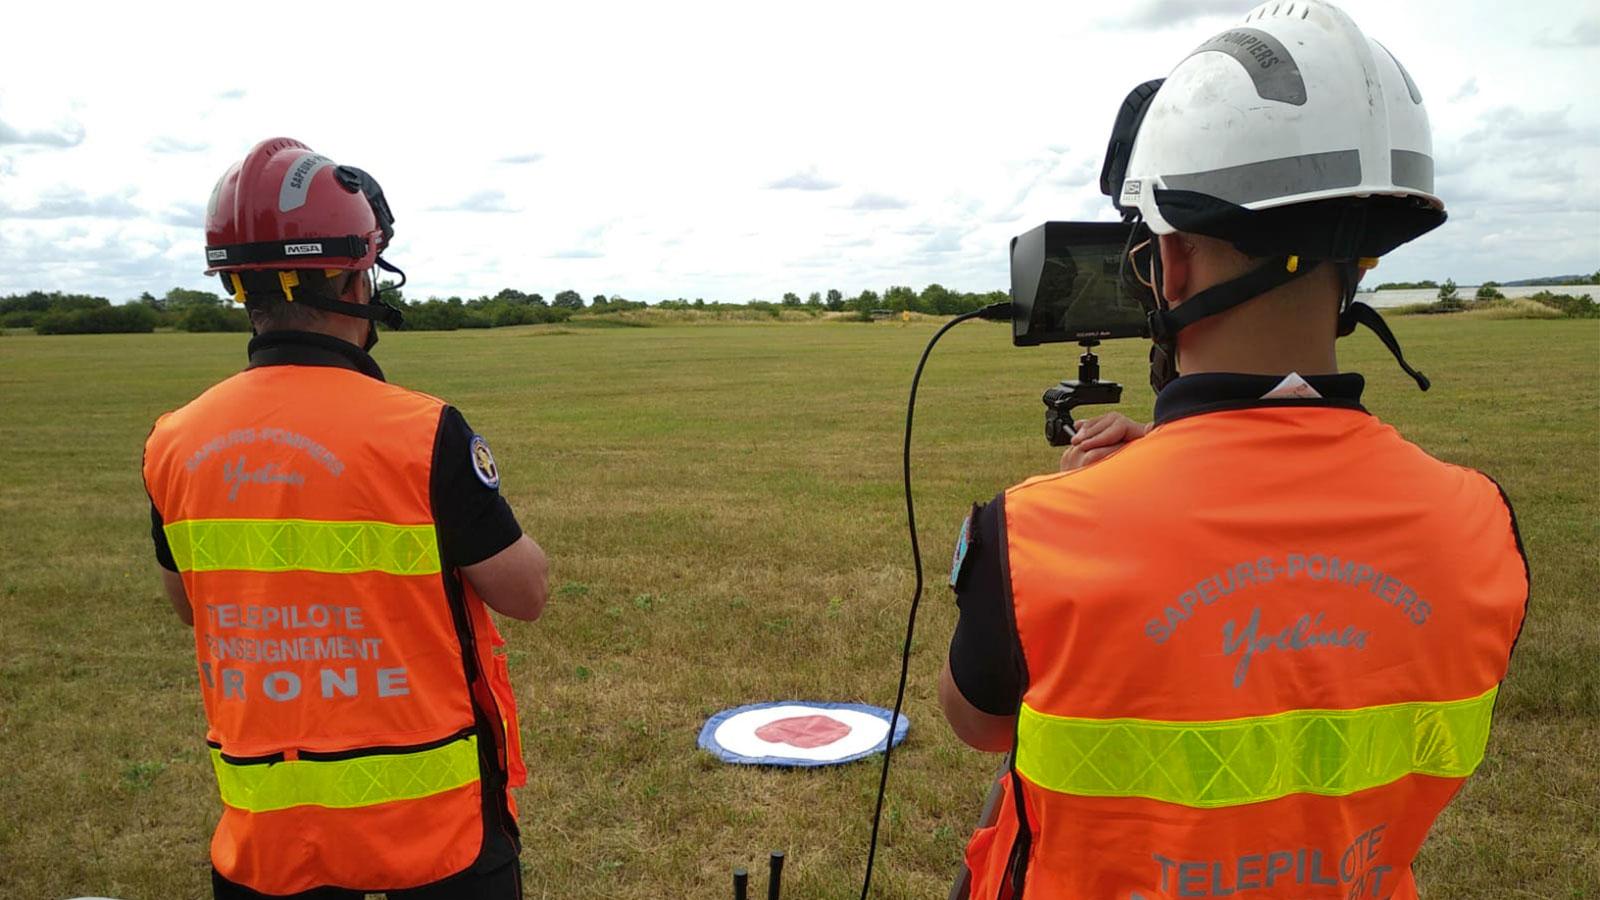 pilots working in the field